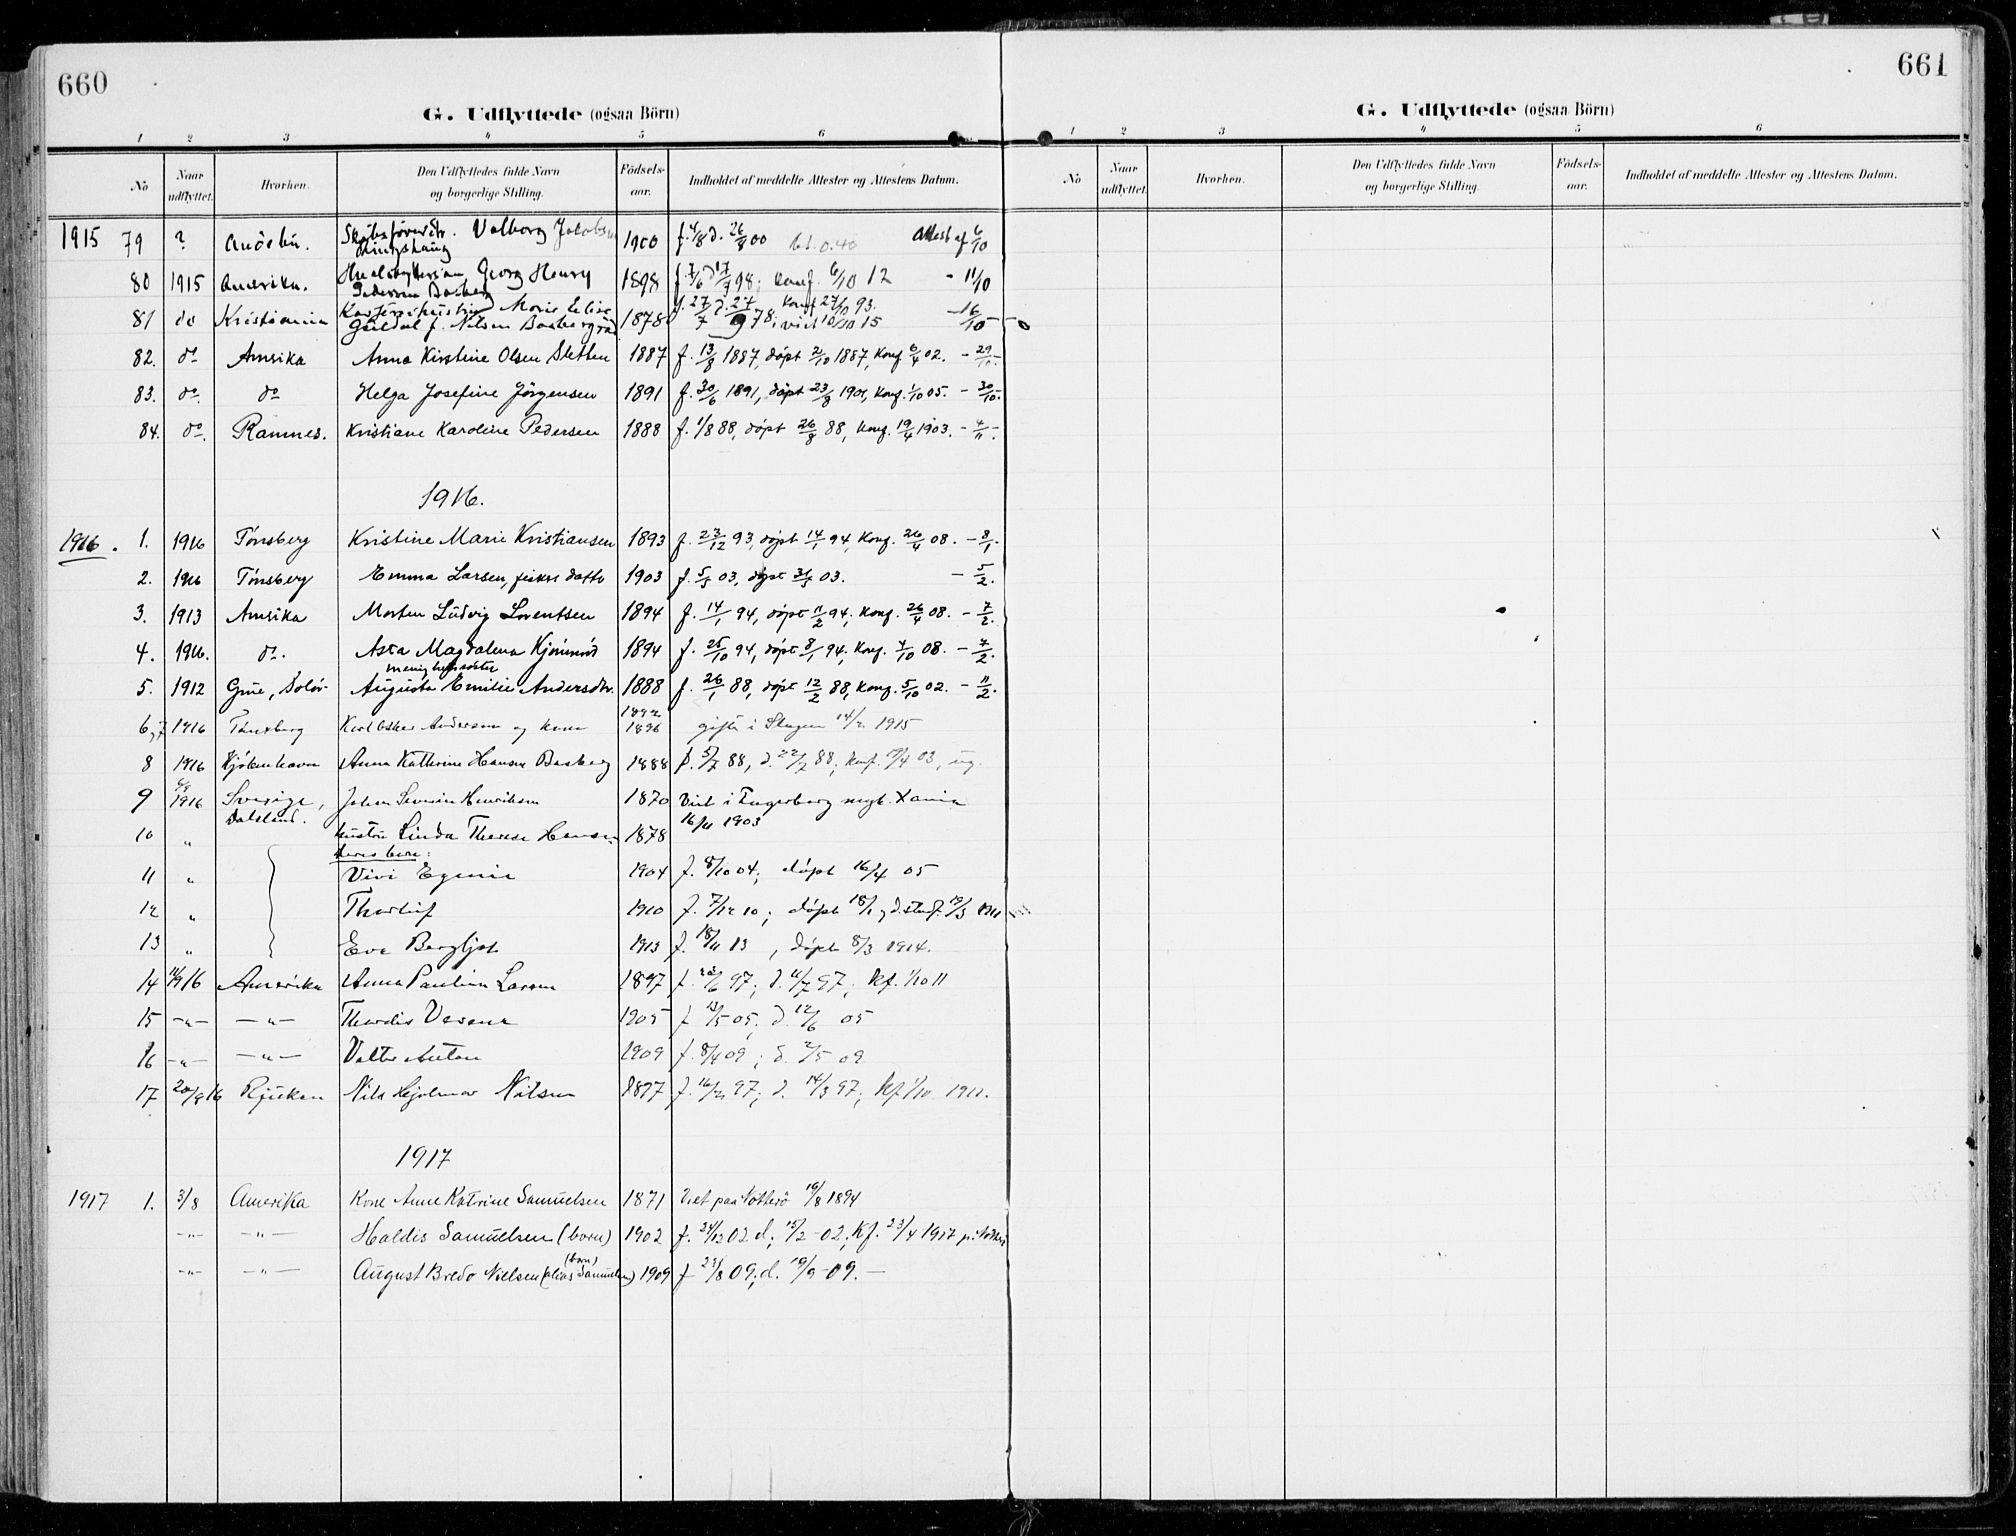 SAKO, Sem kirkebøker, F/Fb/L0006: Ministerialbok nr. II 6, 1905-1918, s. 660-661